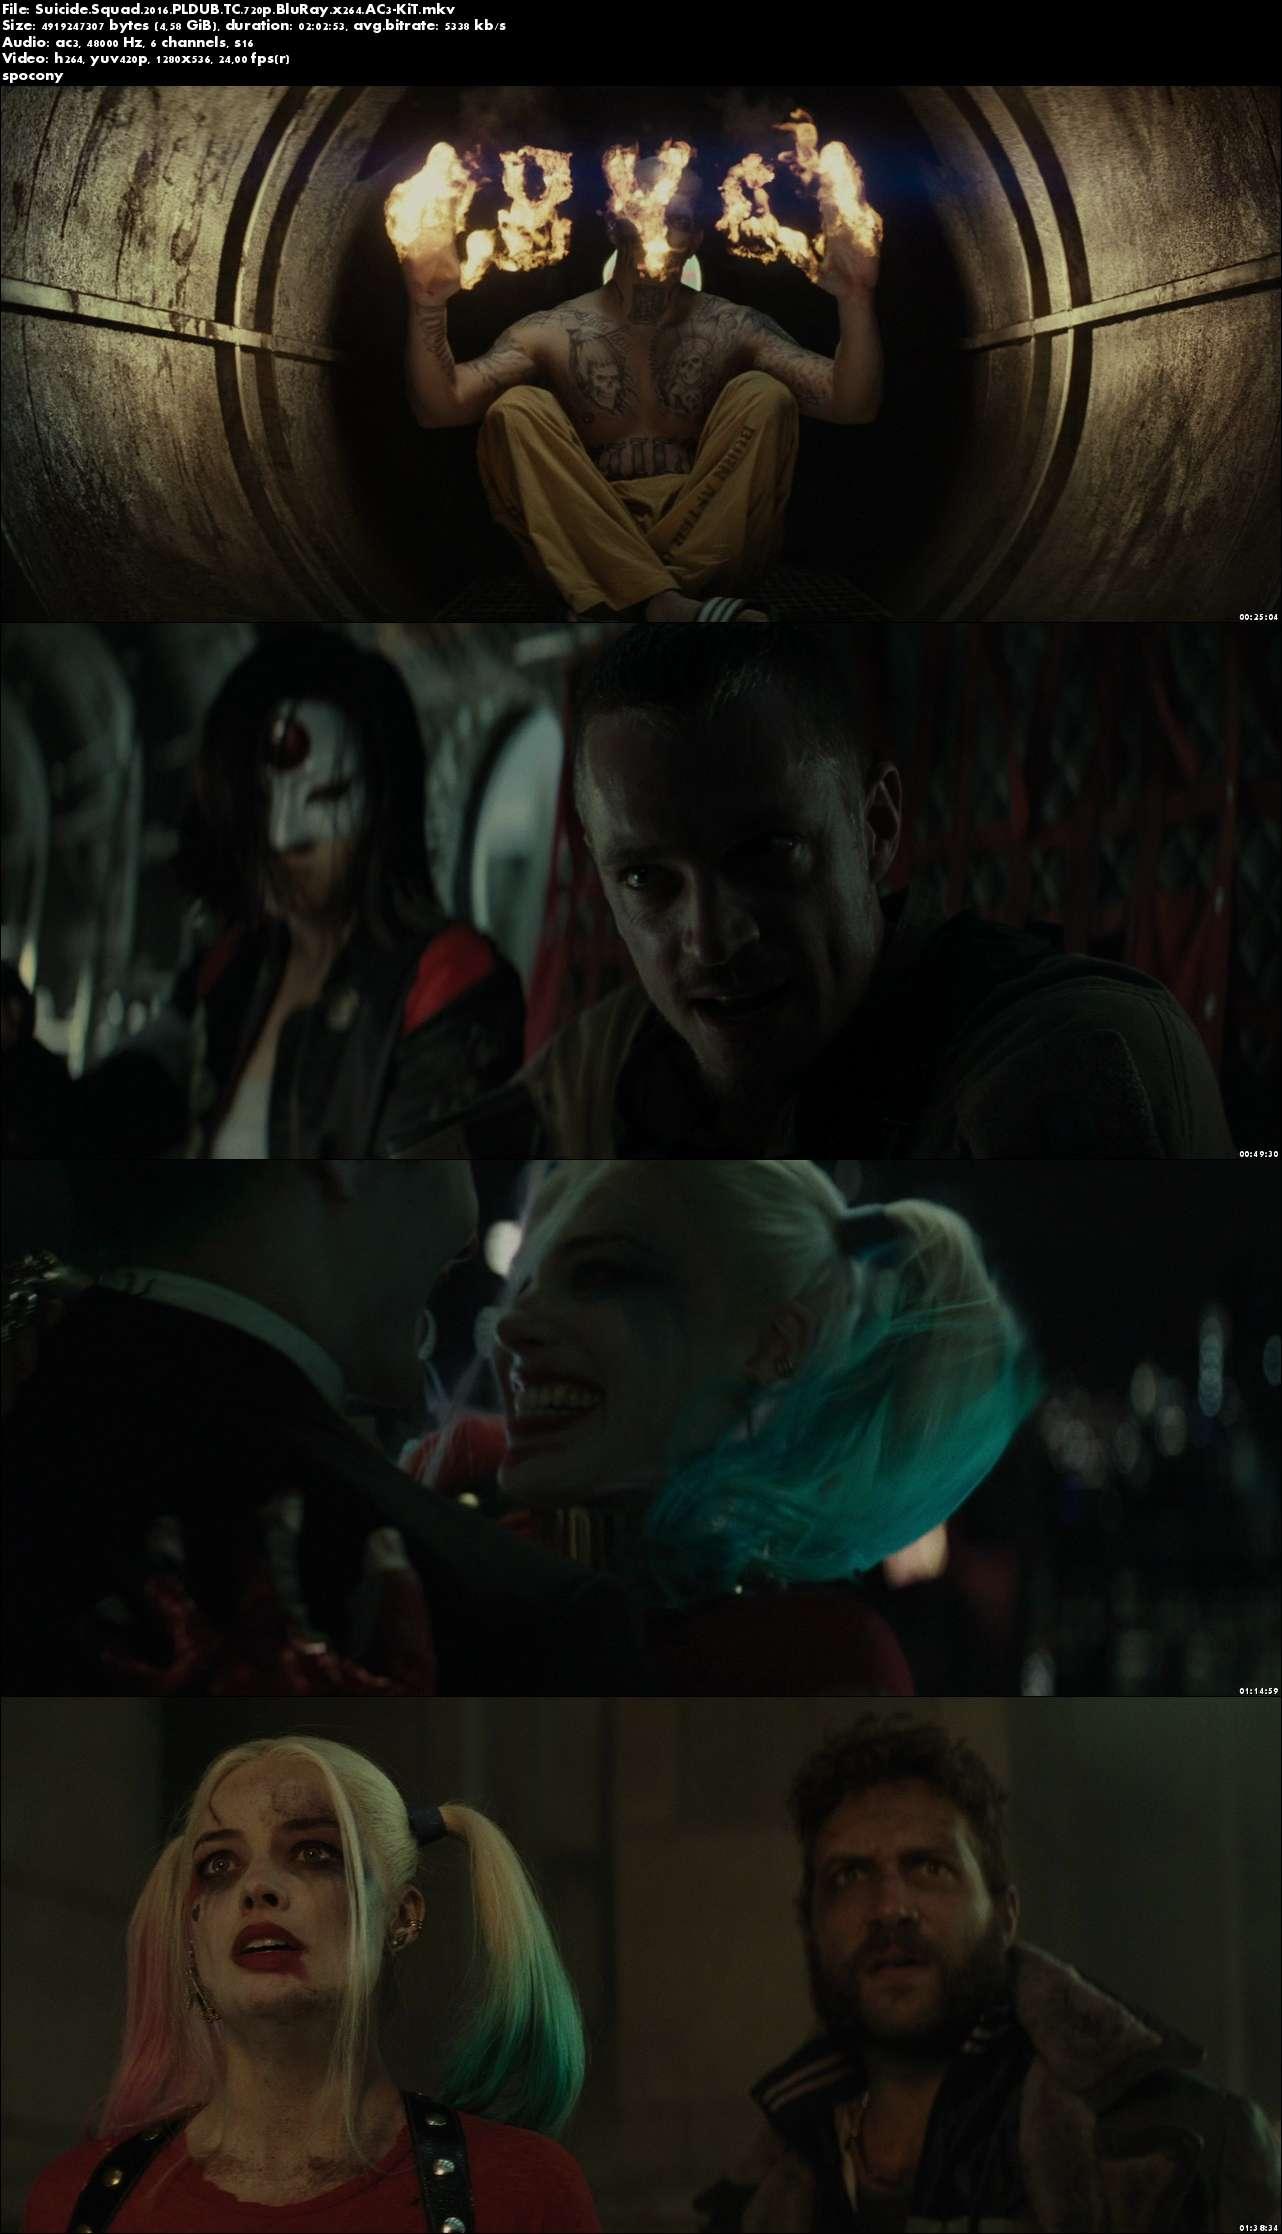 Legion samobójców / Suicide Squad (2016) PLDUB.TC.720p.BluRay.x264.AC3-KiT [Dubbing PL]